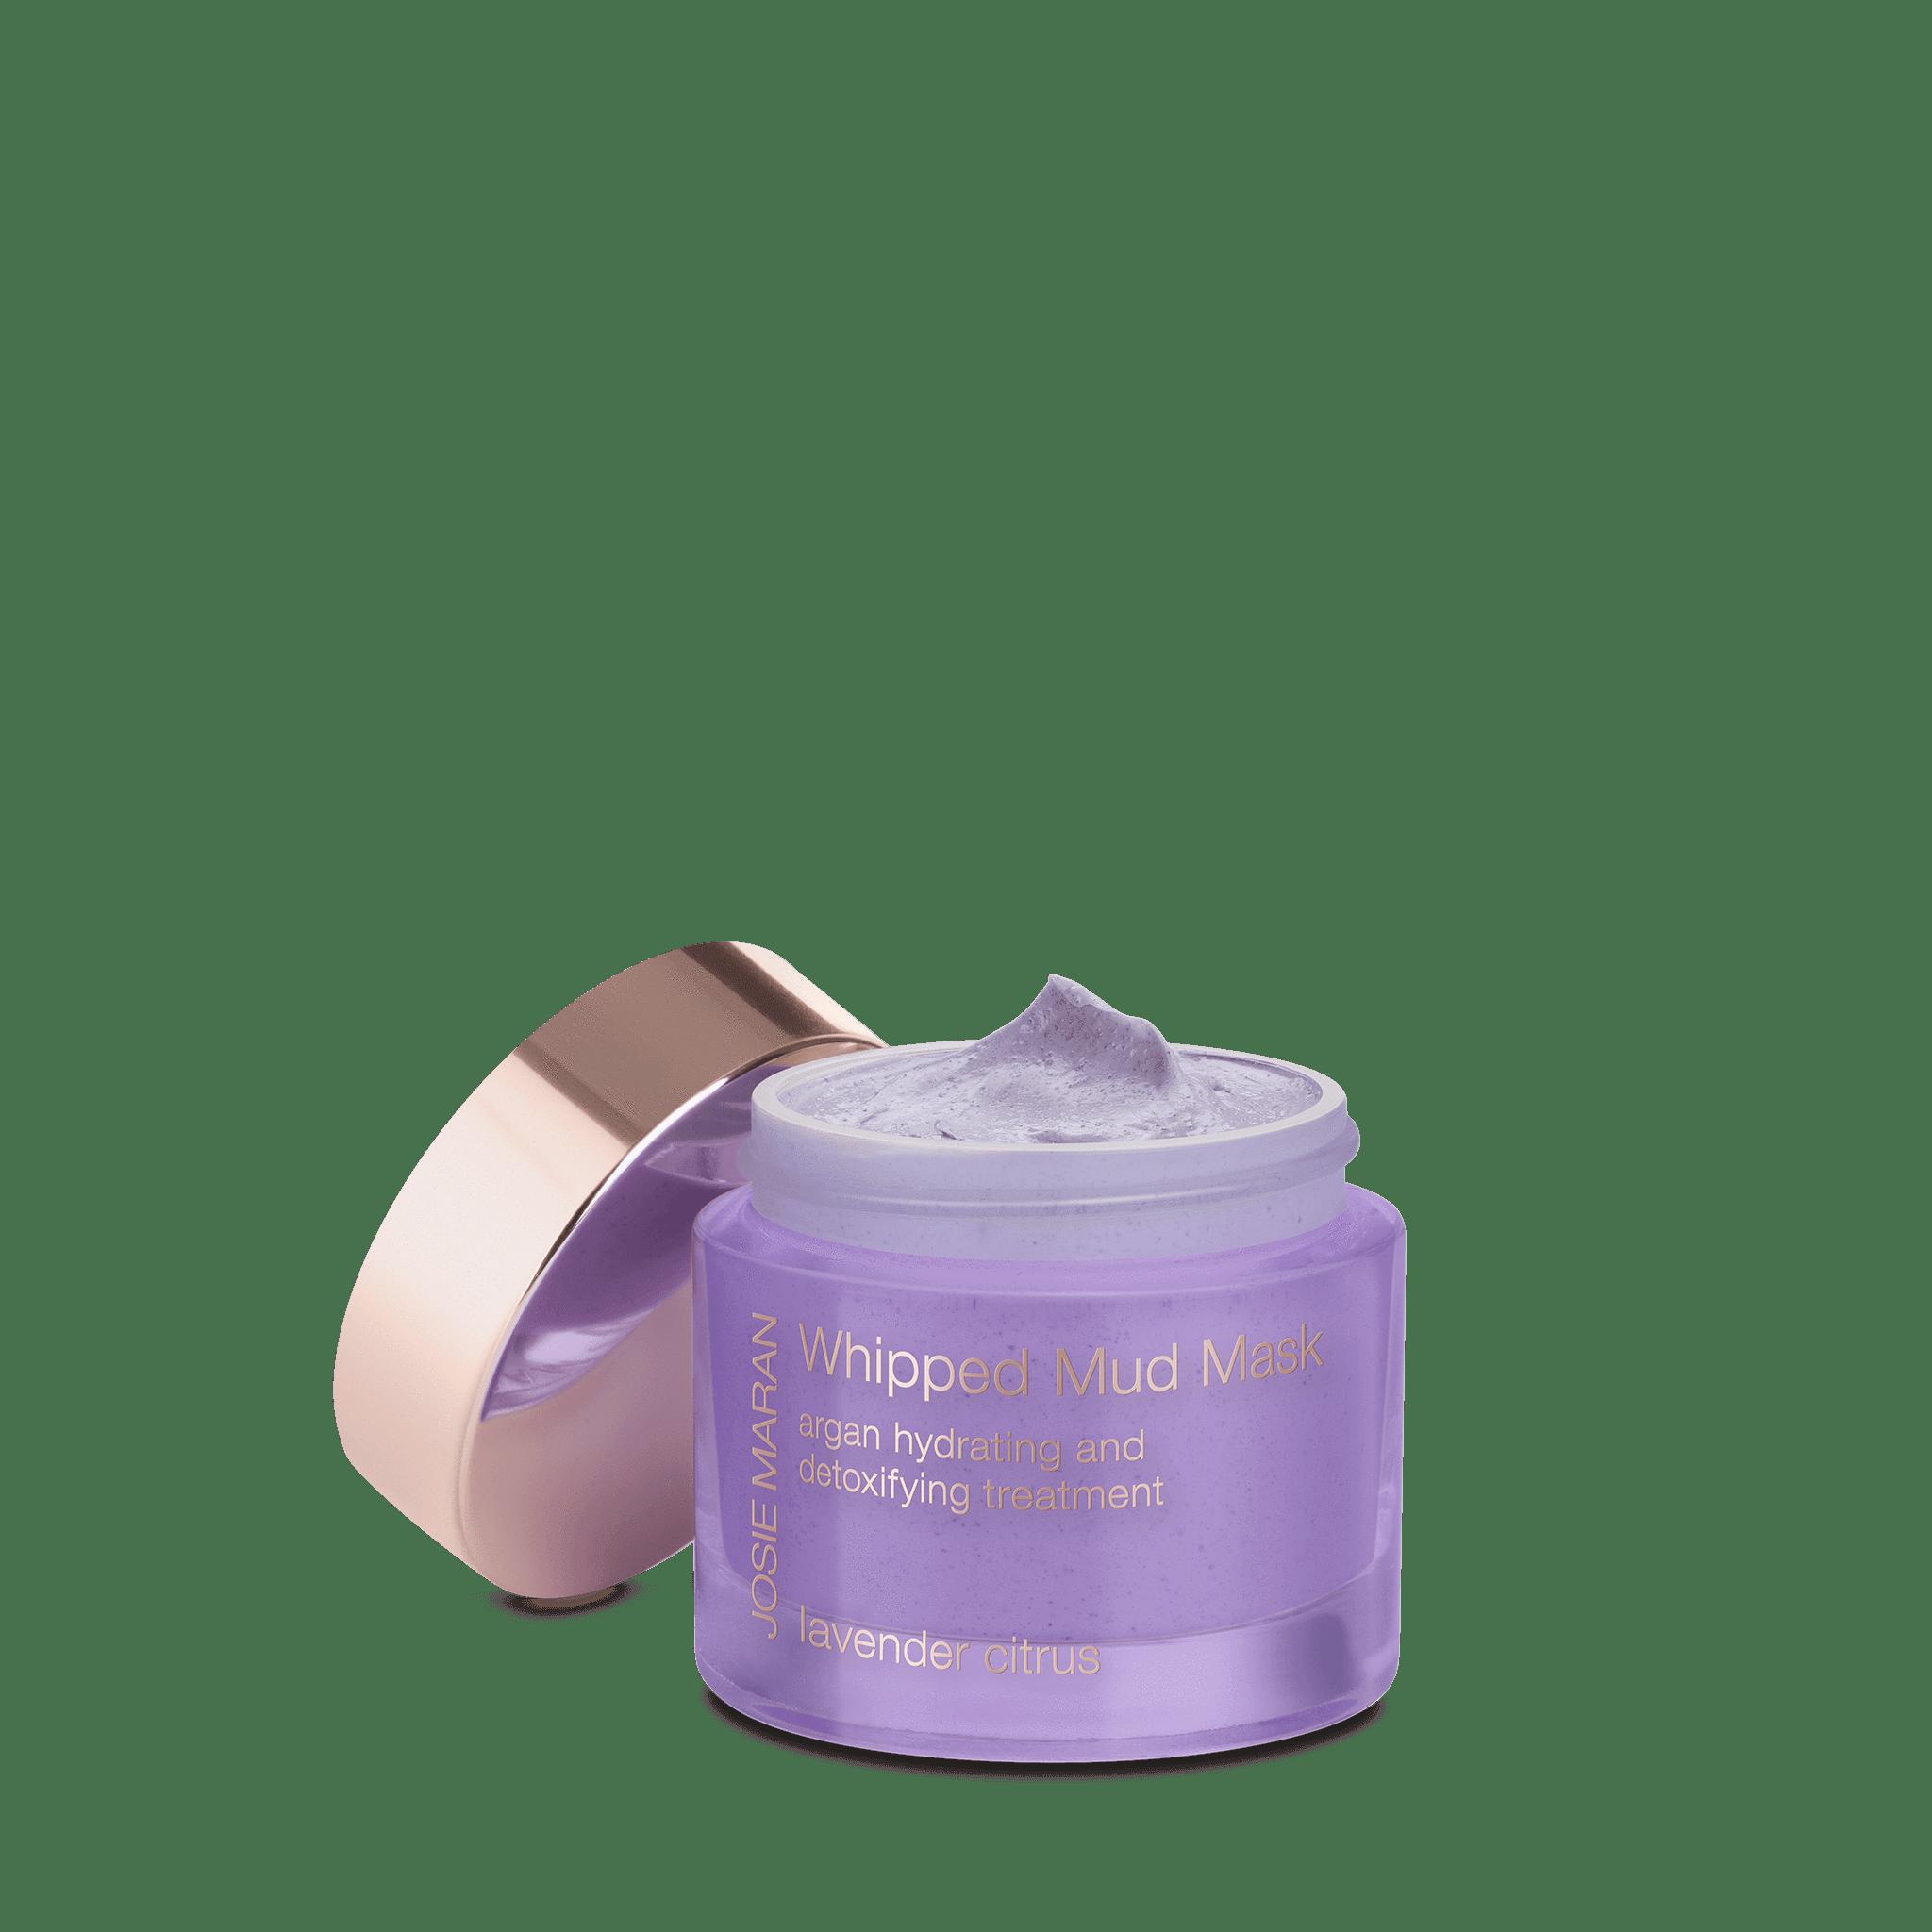 Josie Maran Whipped Mud Mask Argan Hydrating and Detoxifying Treatment Lavender Citrus